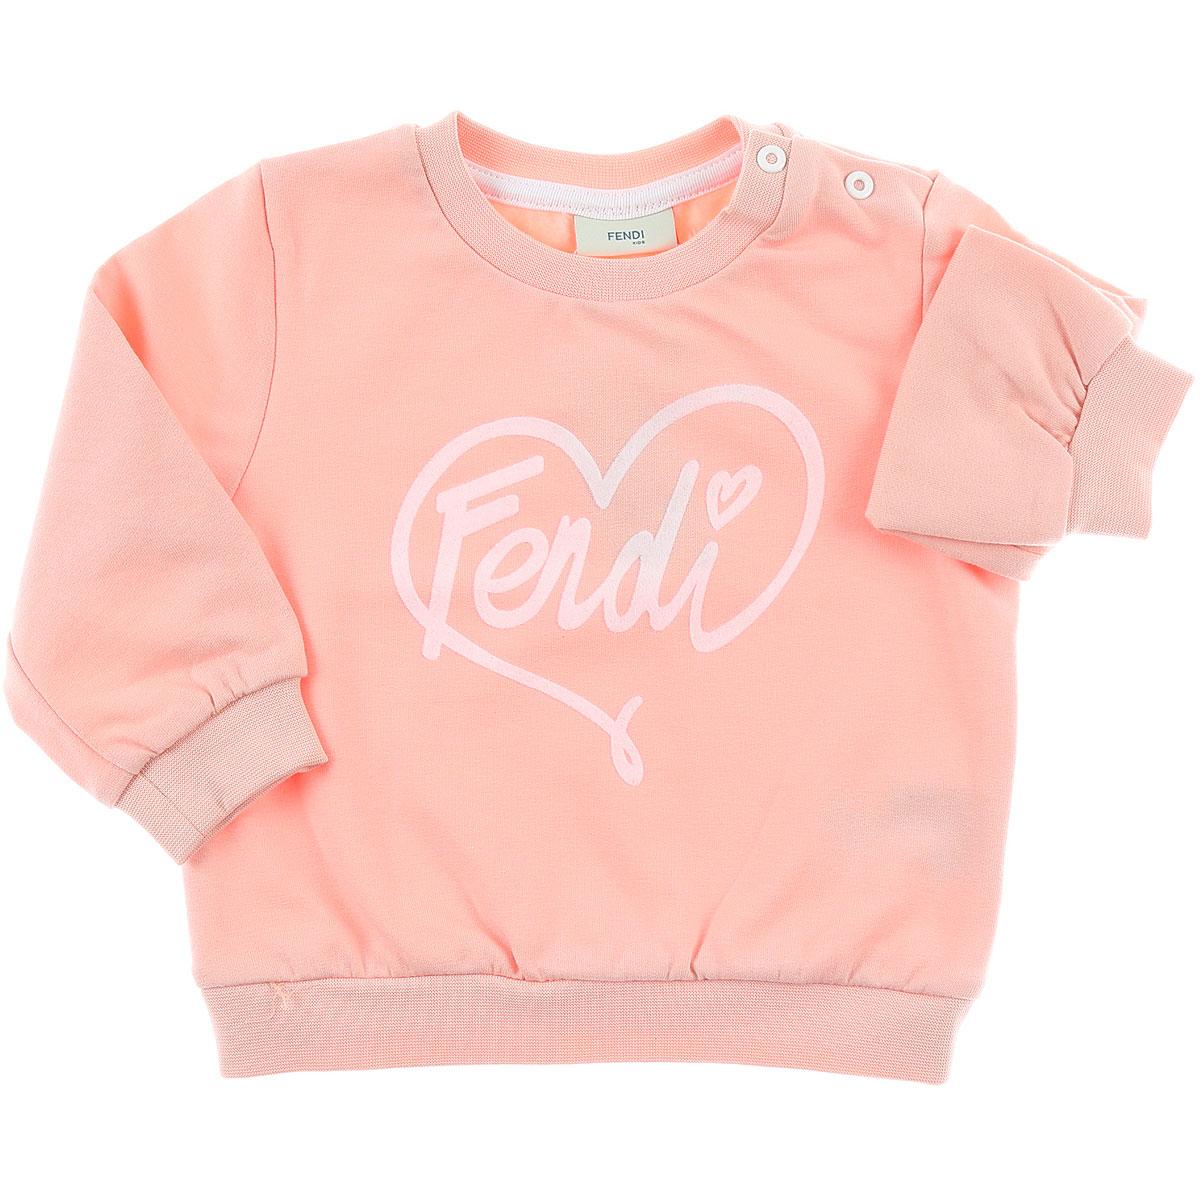 Image of Fendi Baby Sweatshirts & Hoodies for Girls, Pink, Cotton, 2017, 12M 18M 2Y 6M 9M